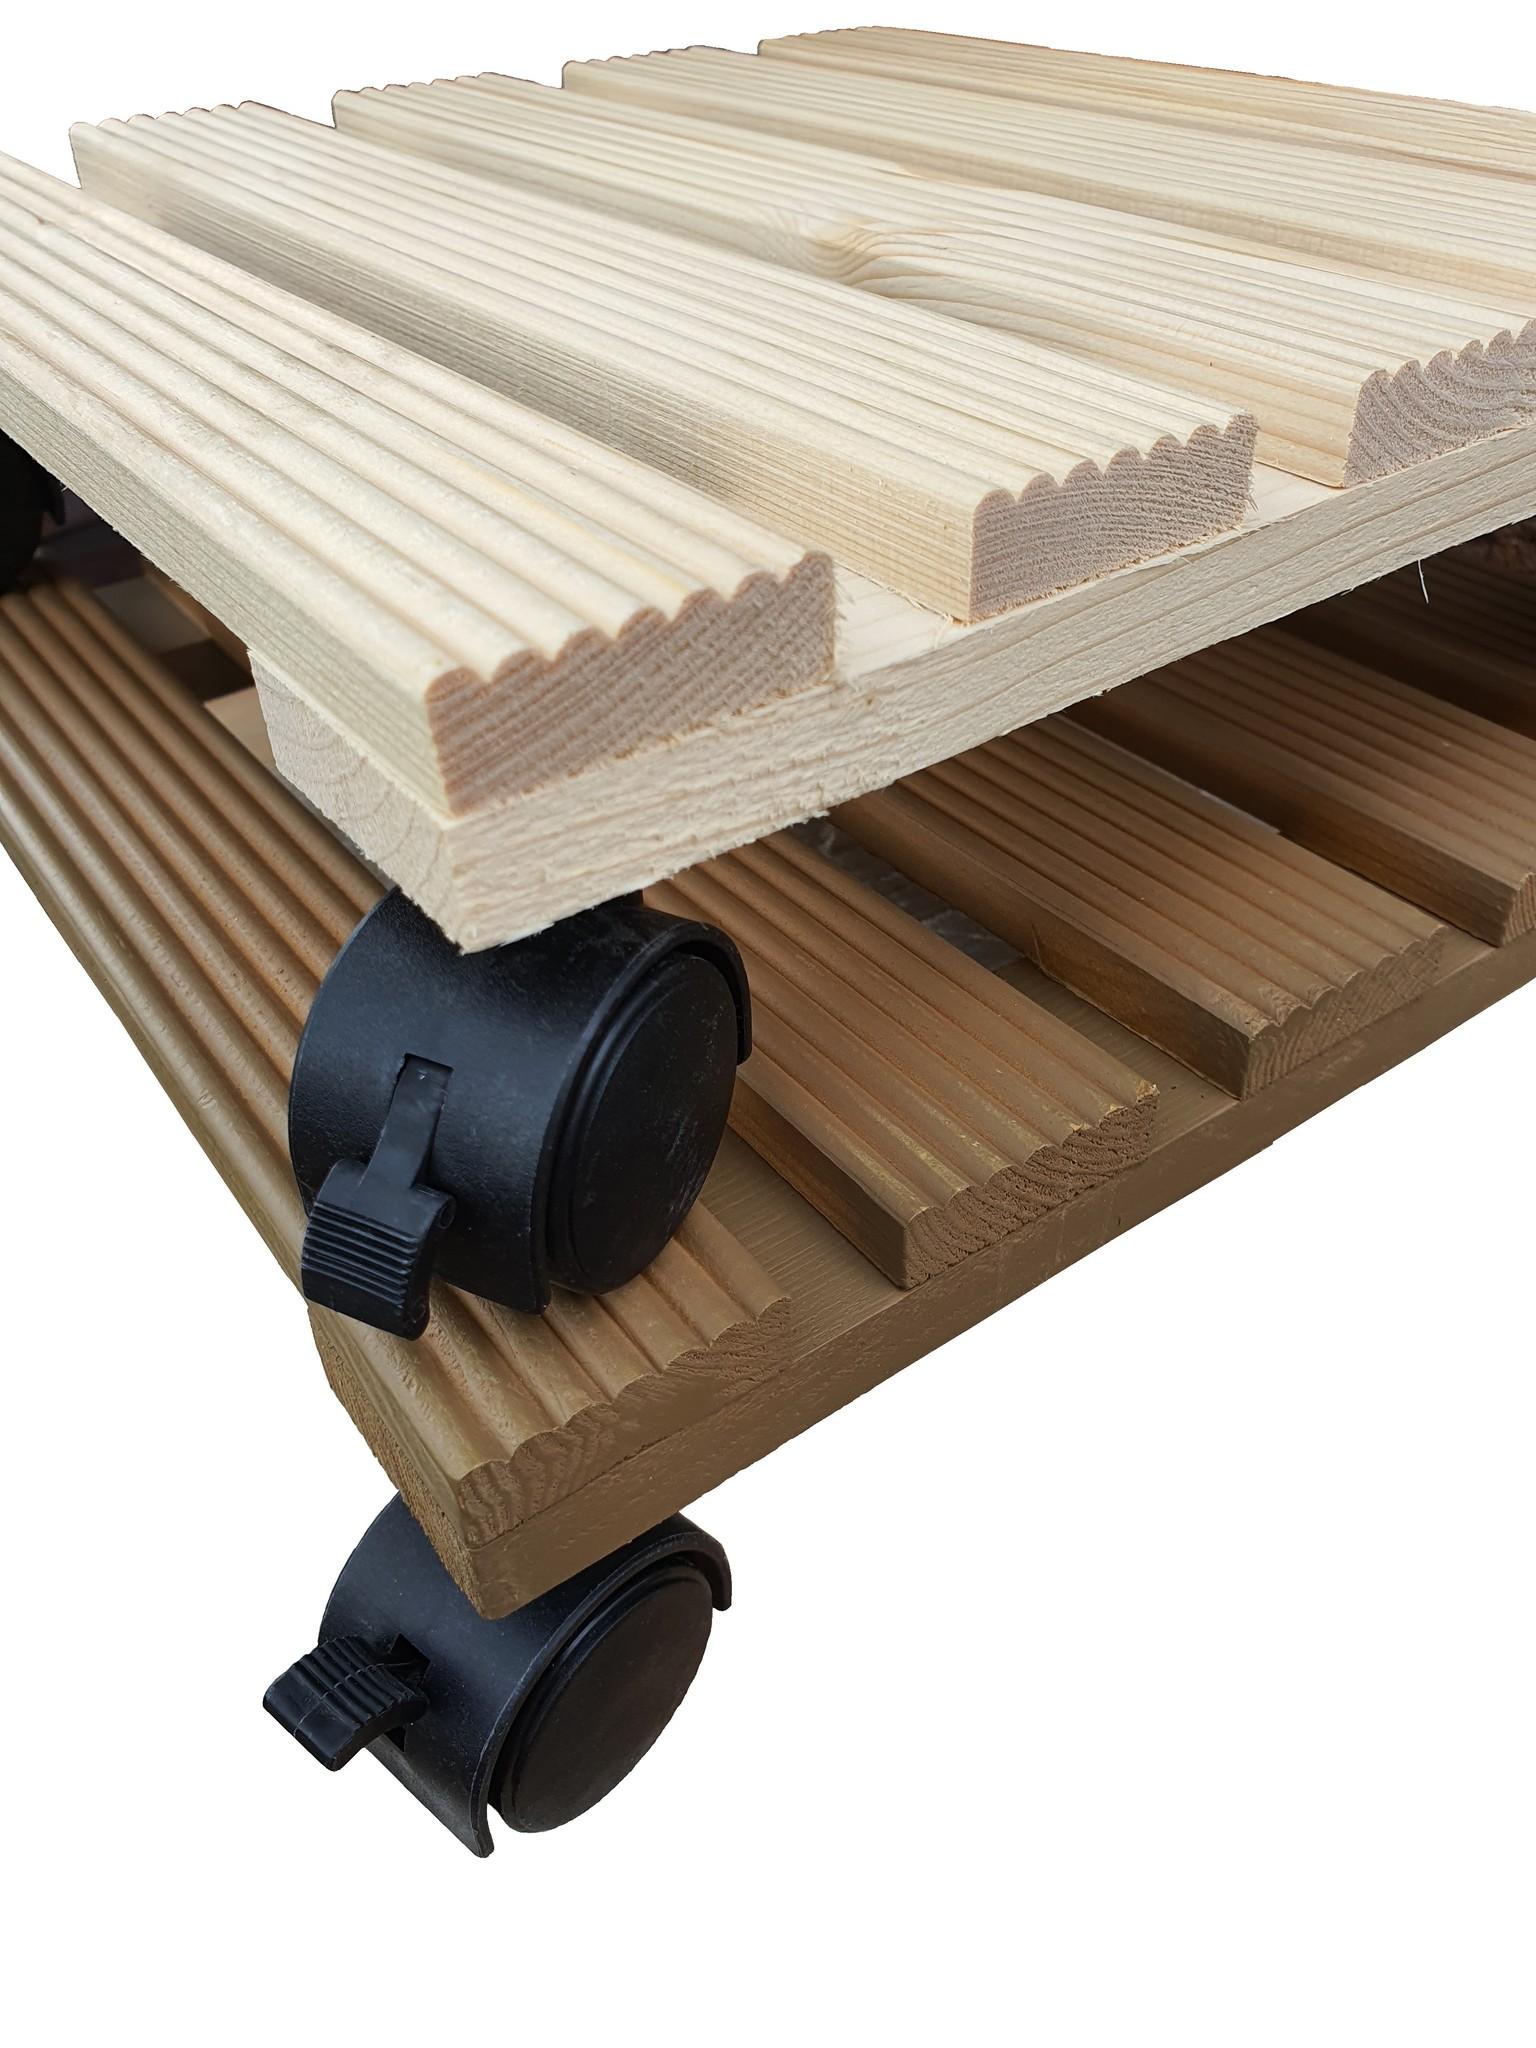 home dec wood plant roller mix 29-1